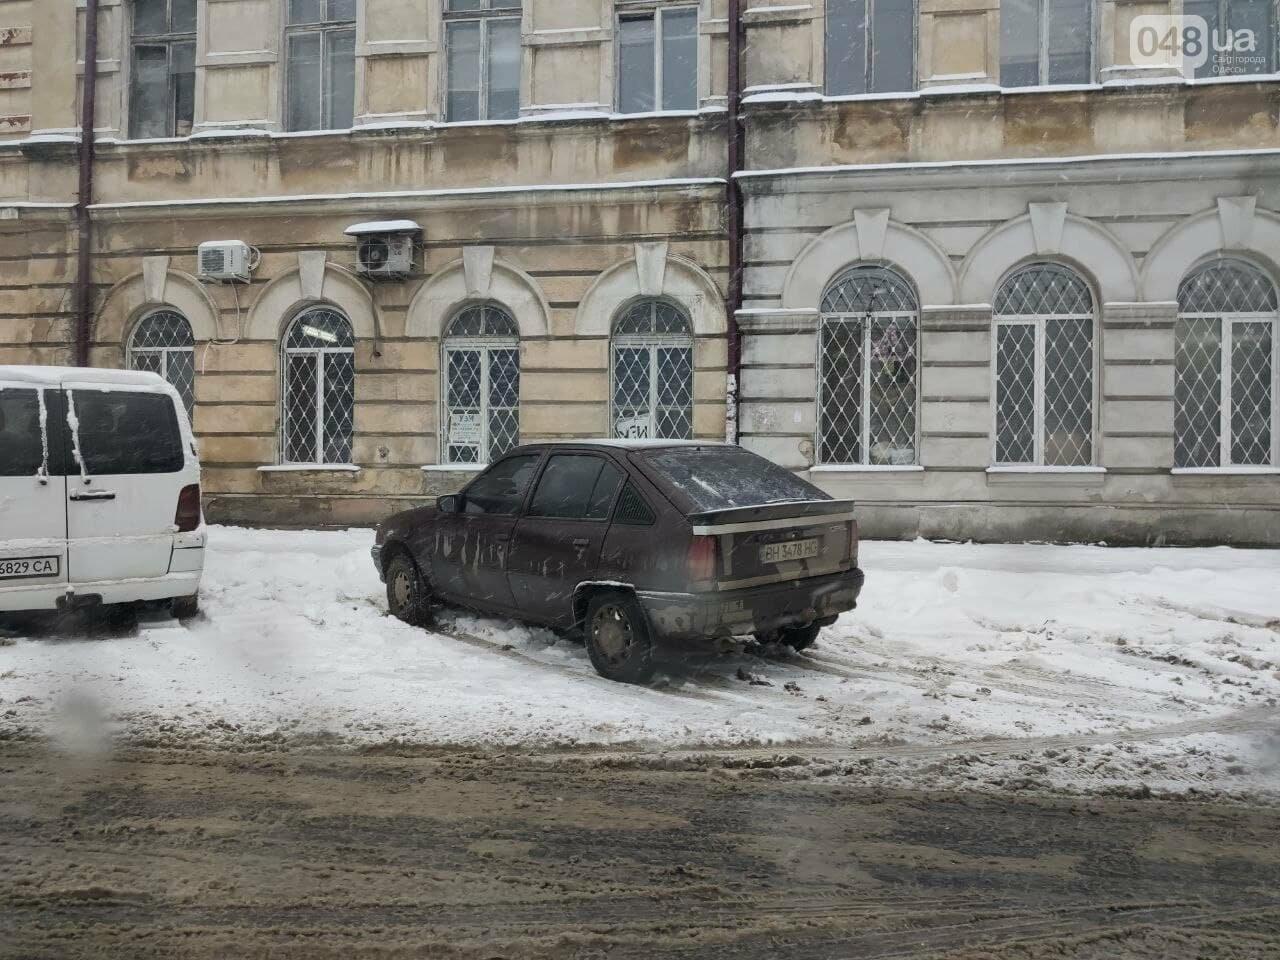 Одессу замело: ситуация на дорогах и тротуарах в городе, - ФОТО, фото-9